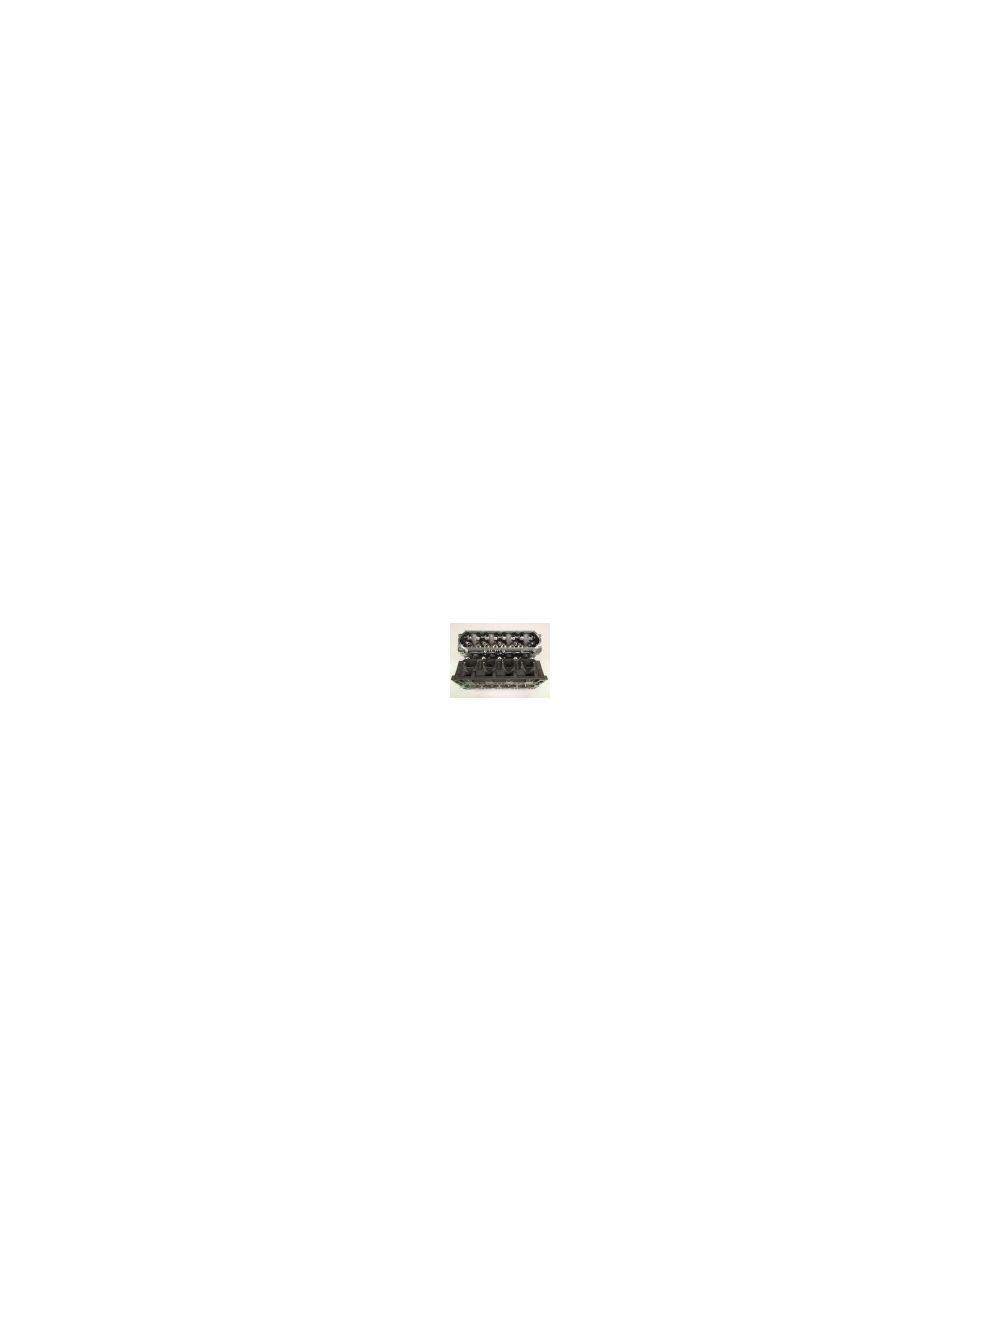 KATECH CNC PORT GEN 5 LT4/LT5 CYLINDER HEADS (PAIR)